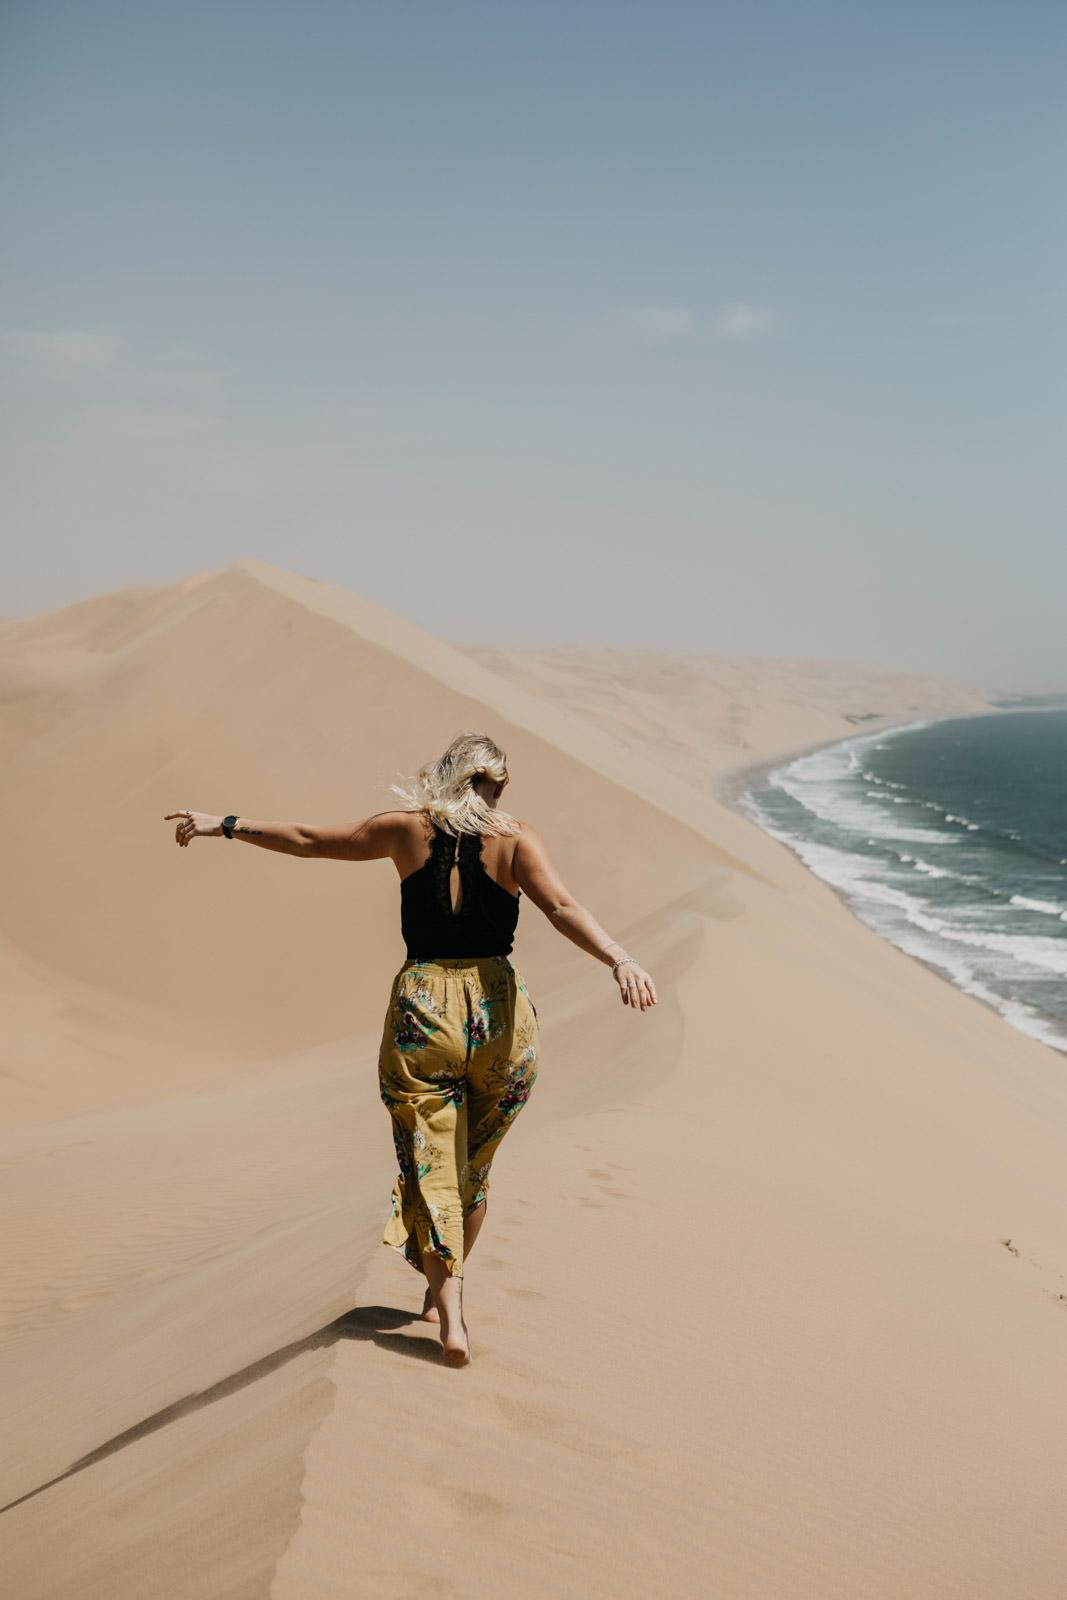 namibia_trip_rooftent_camping_roadtrip (4 von 10).jpg